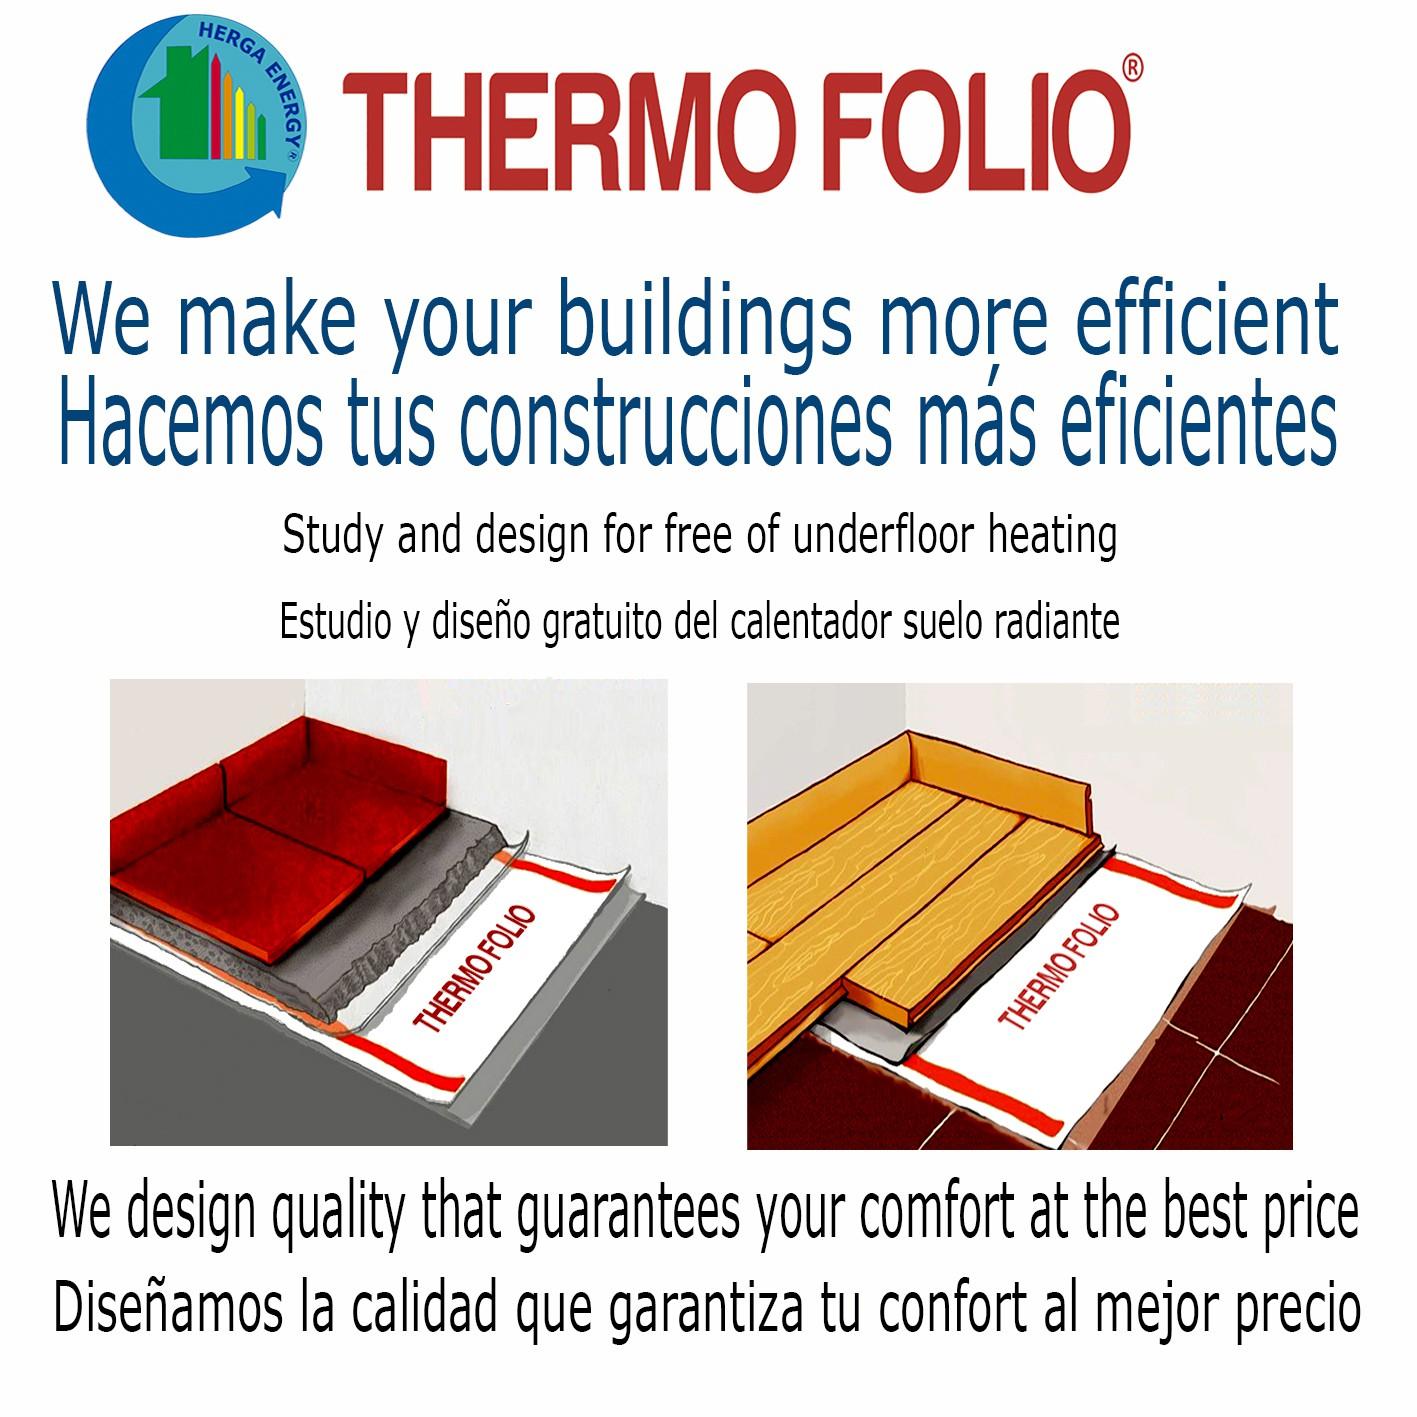 Suelo radiante continuo el ctrico thermo folio herga energy senal - Folio radiante electrico ...